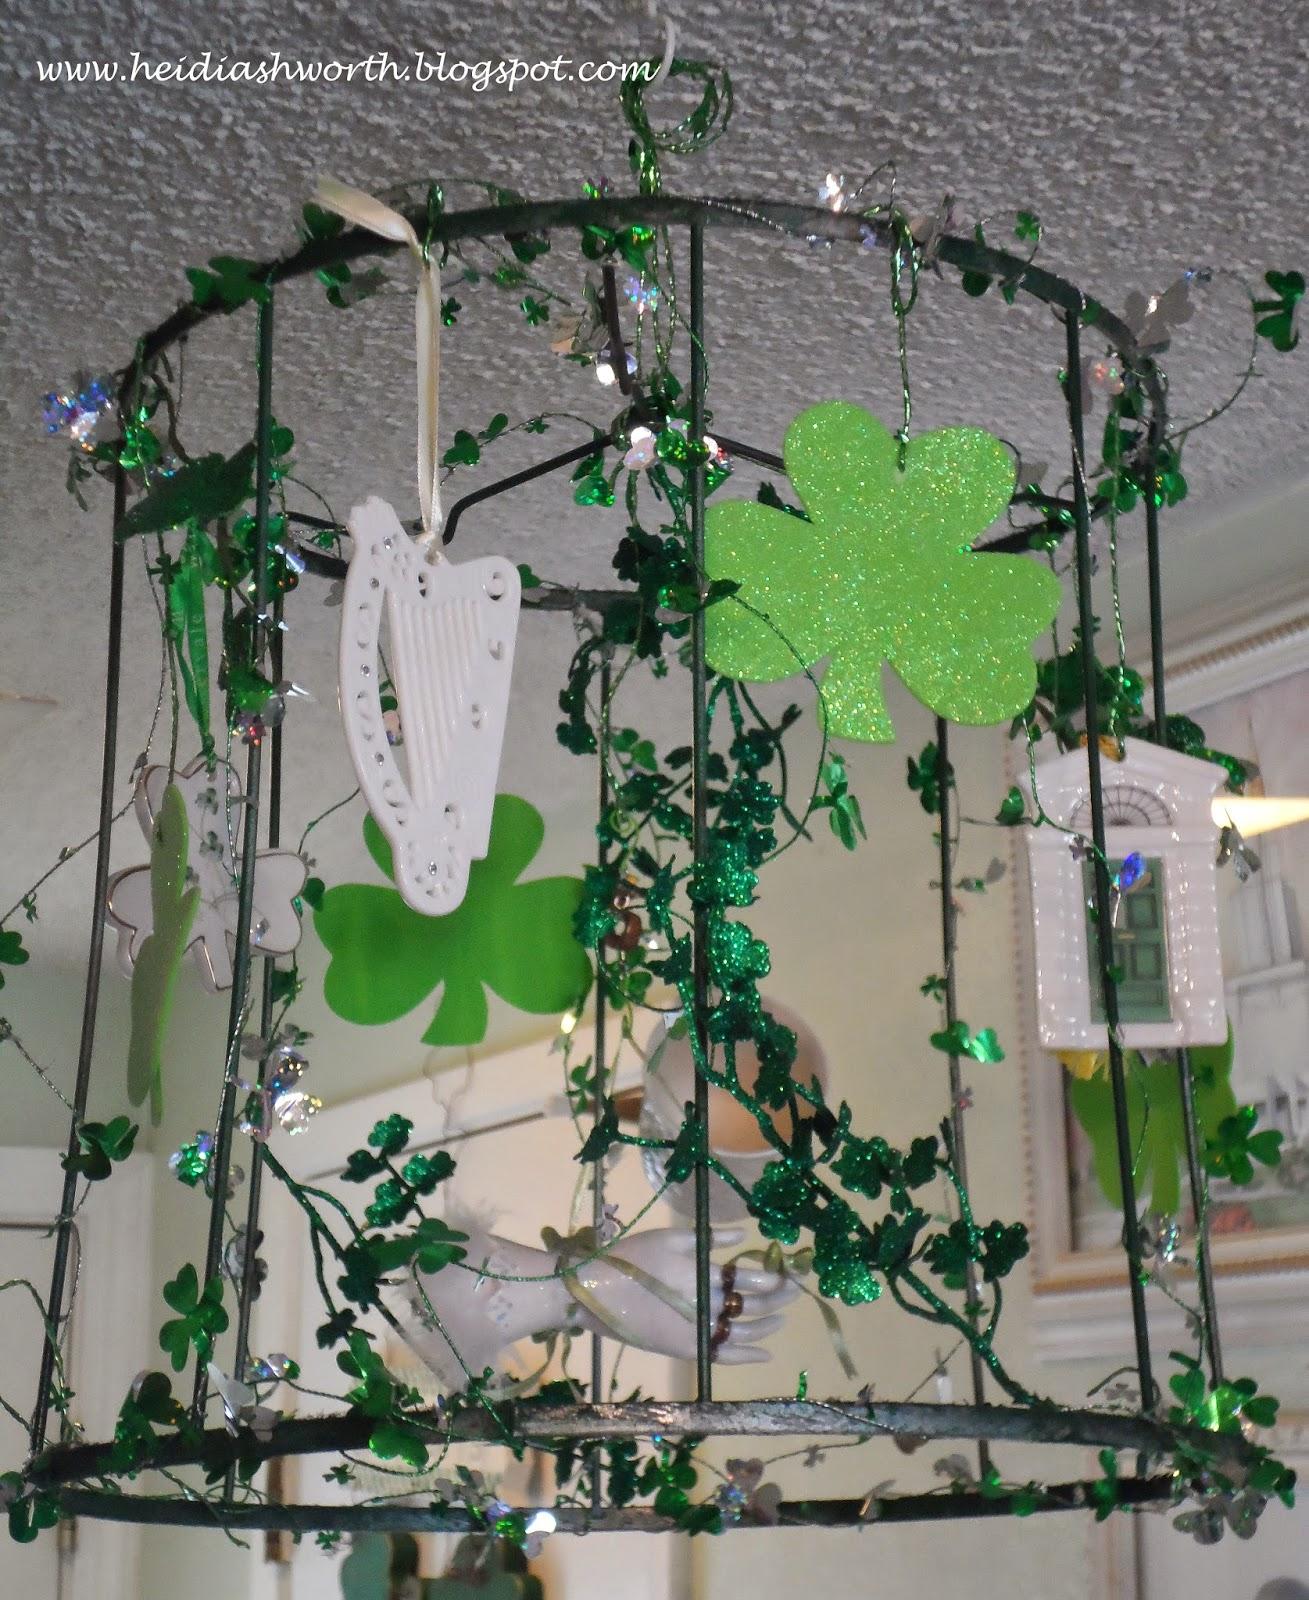 DUNHAVEN PLACE: Repurposing Christmas Ornaments And Decor